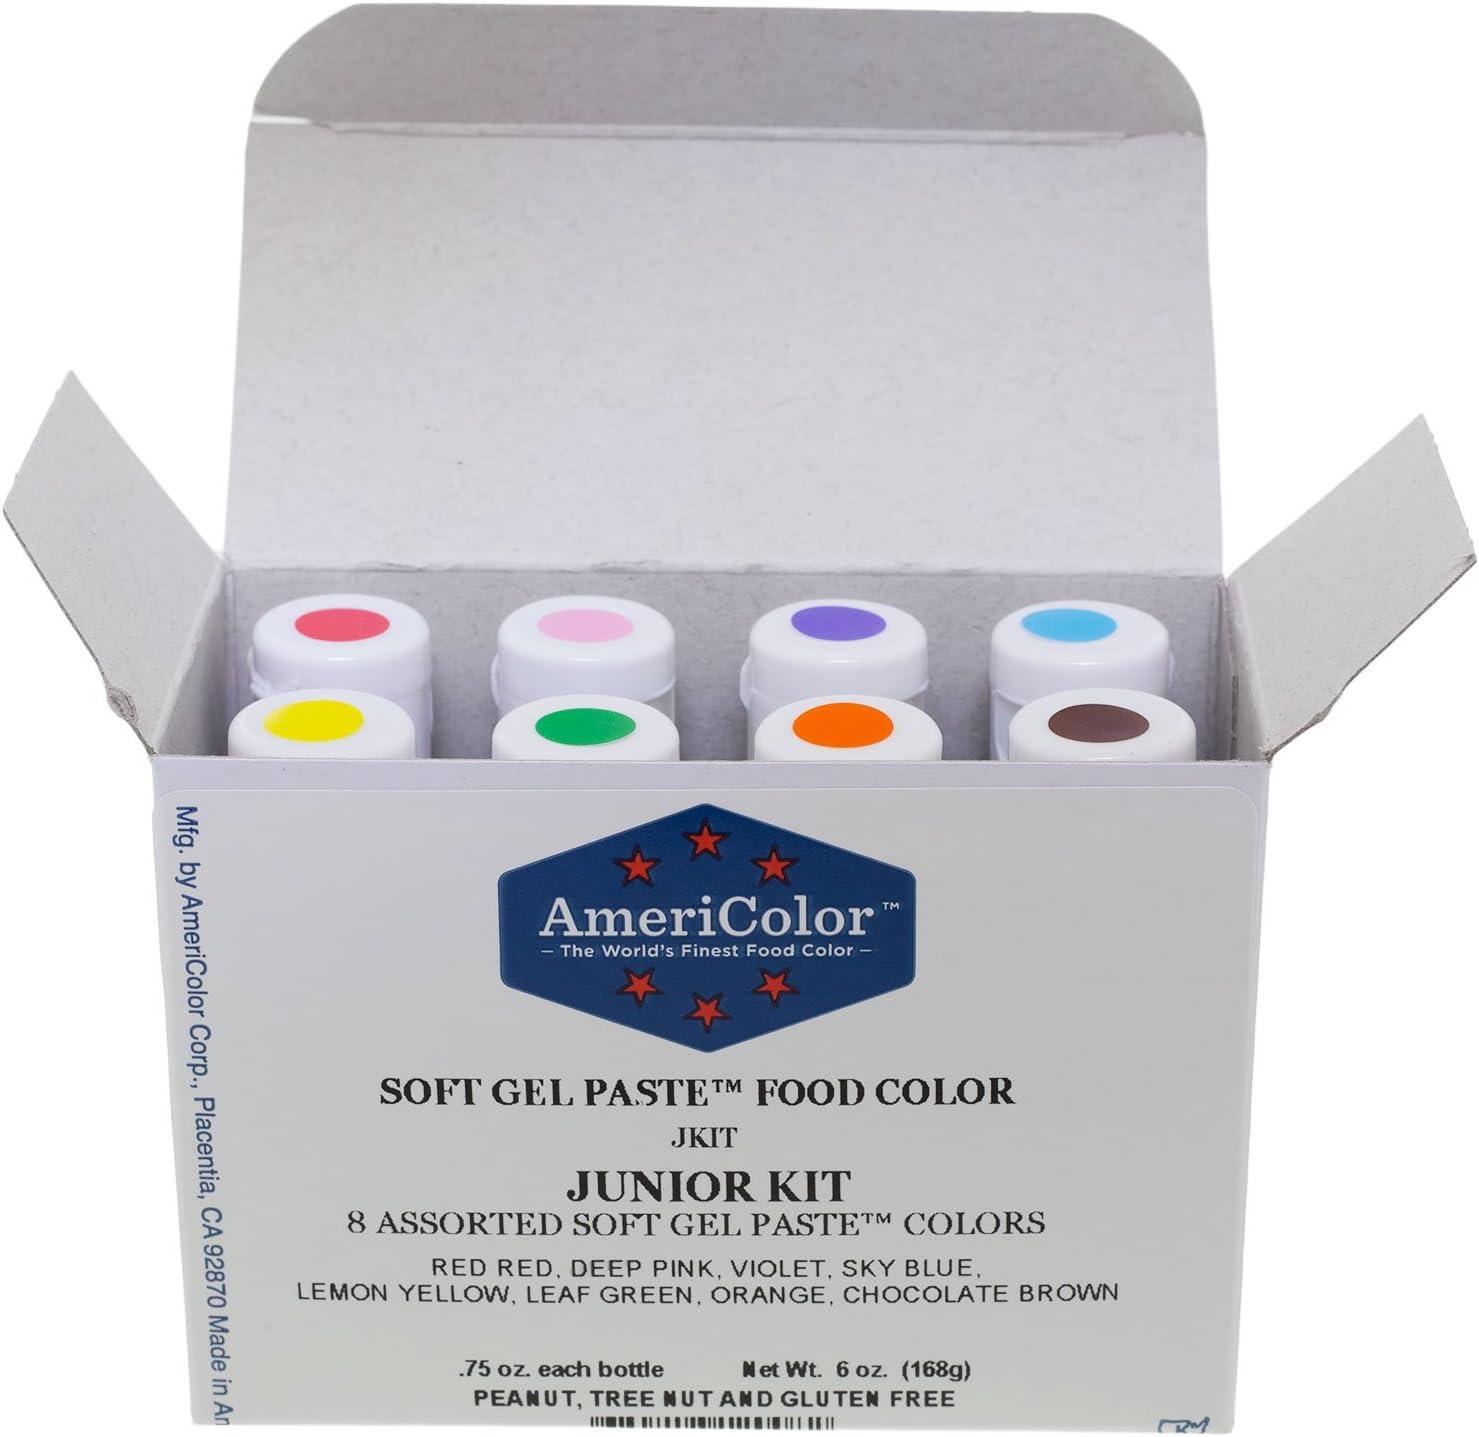 AmeriColor Soft Gel Paste Food Color, Junior Kit-8 assorted colors,0.75 oz bottles by AmeriColor